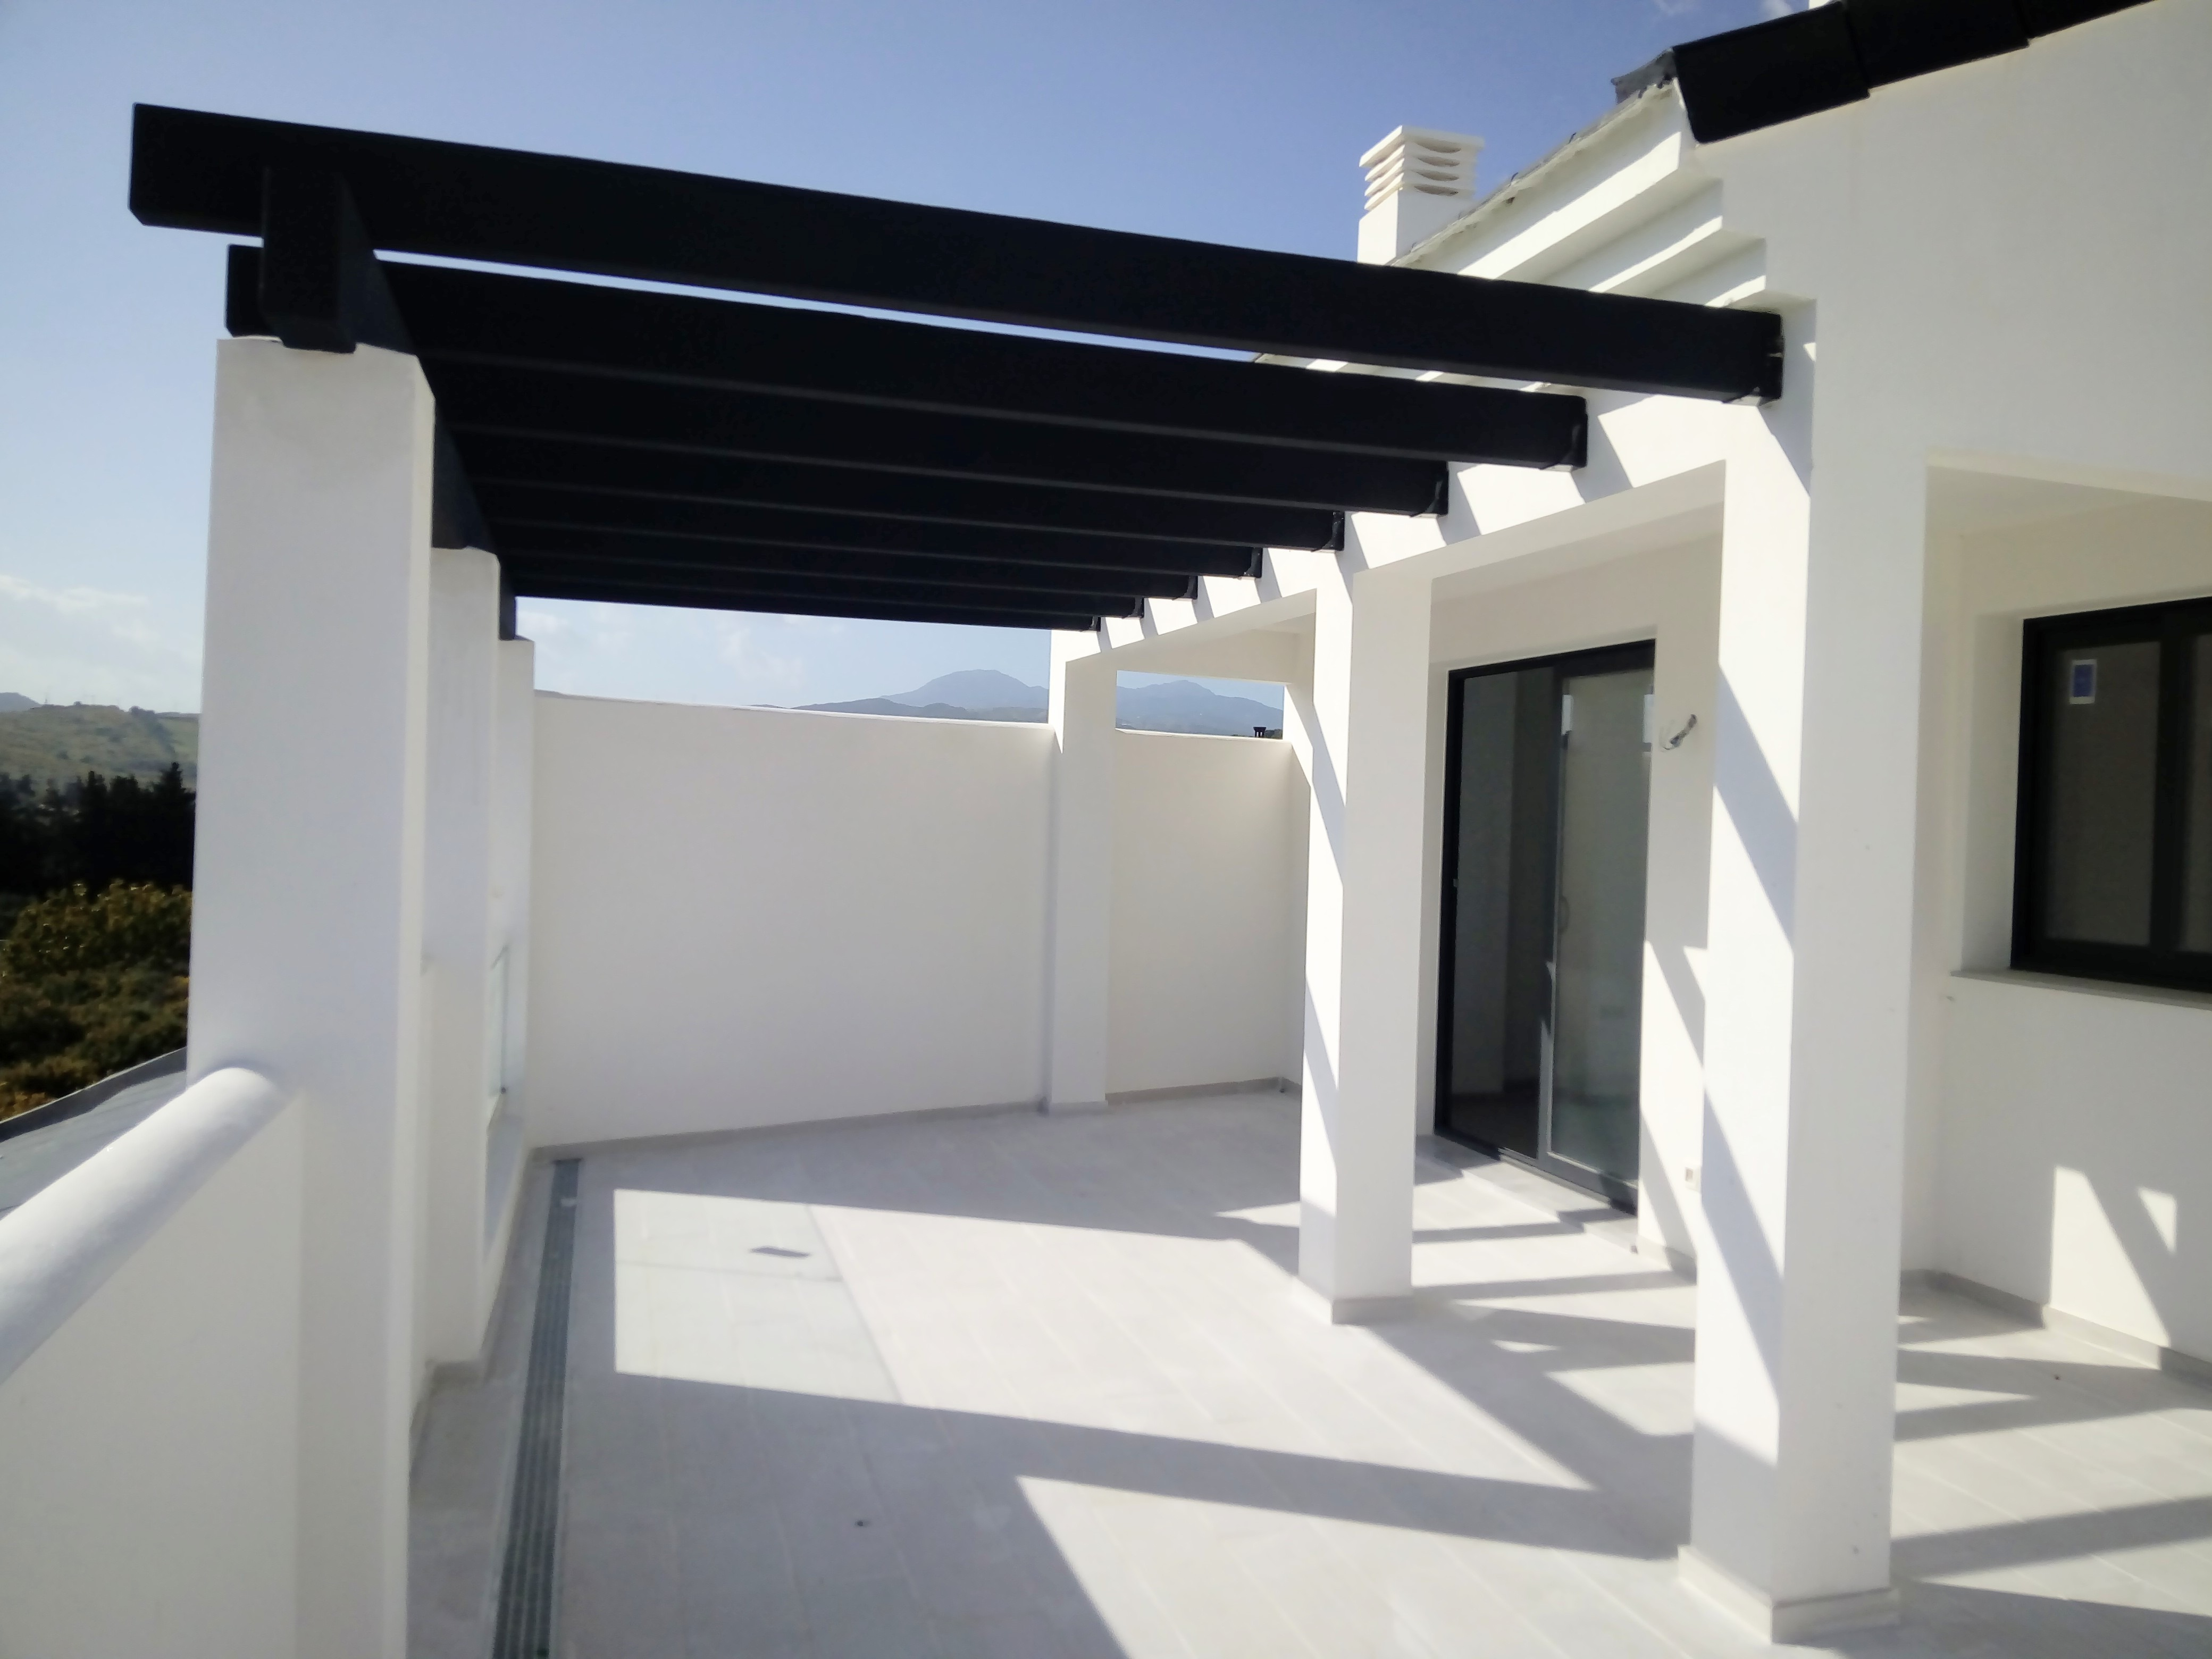 Cordoba penthouse bloc 3, B ground floor covered terrace